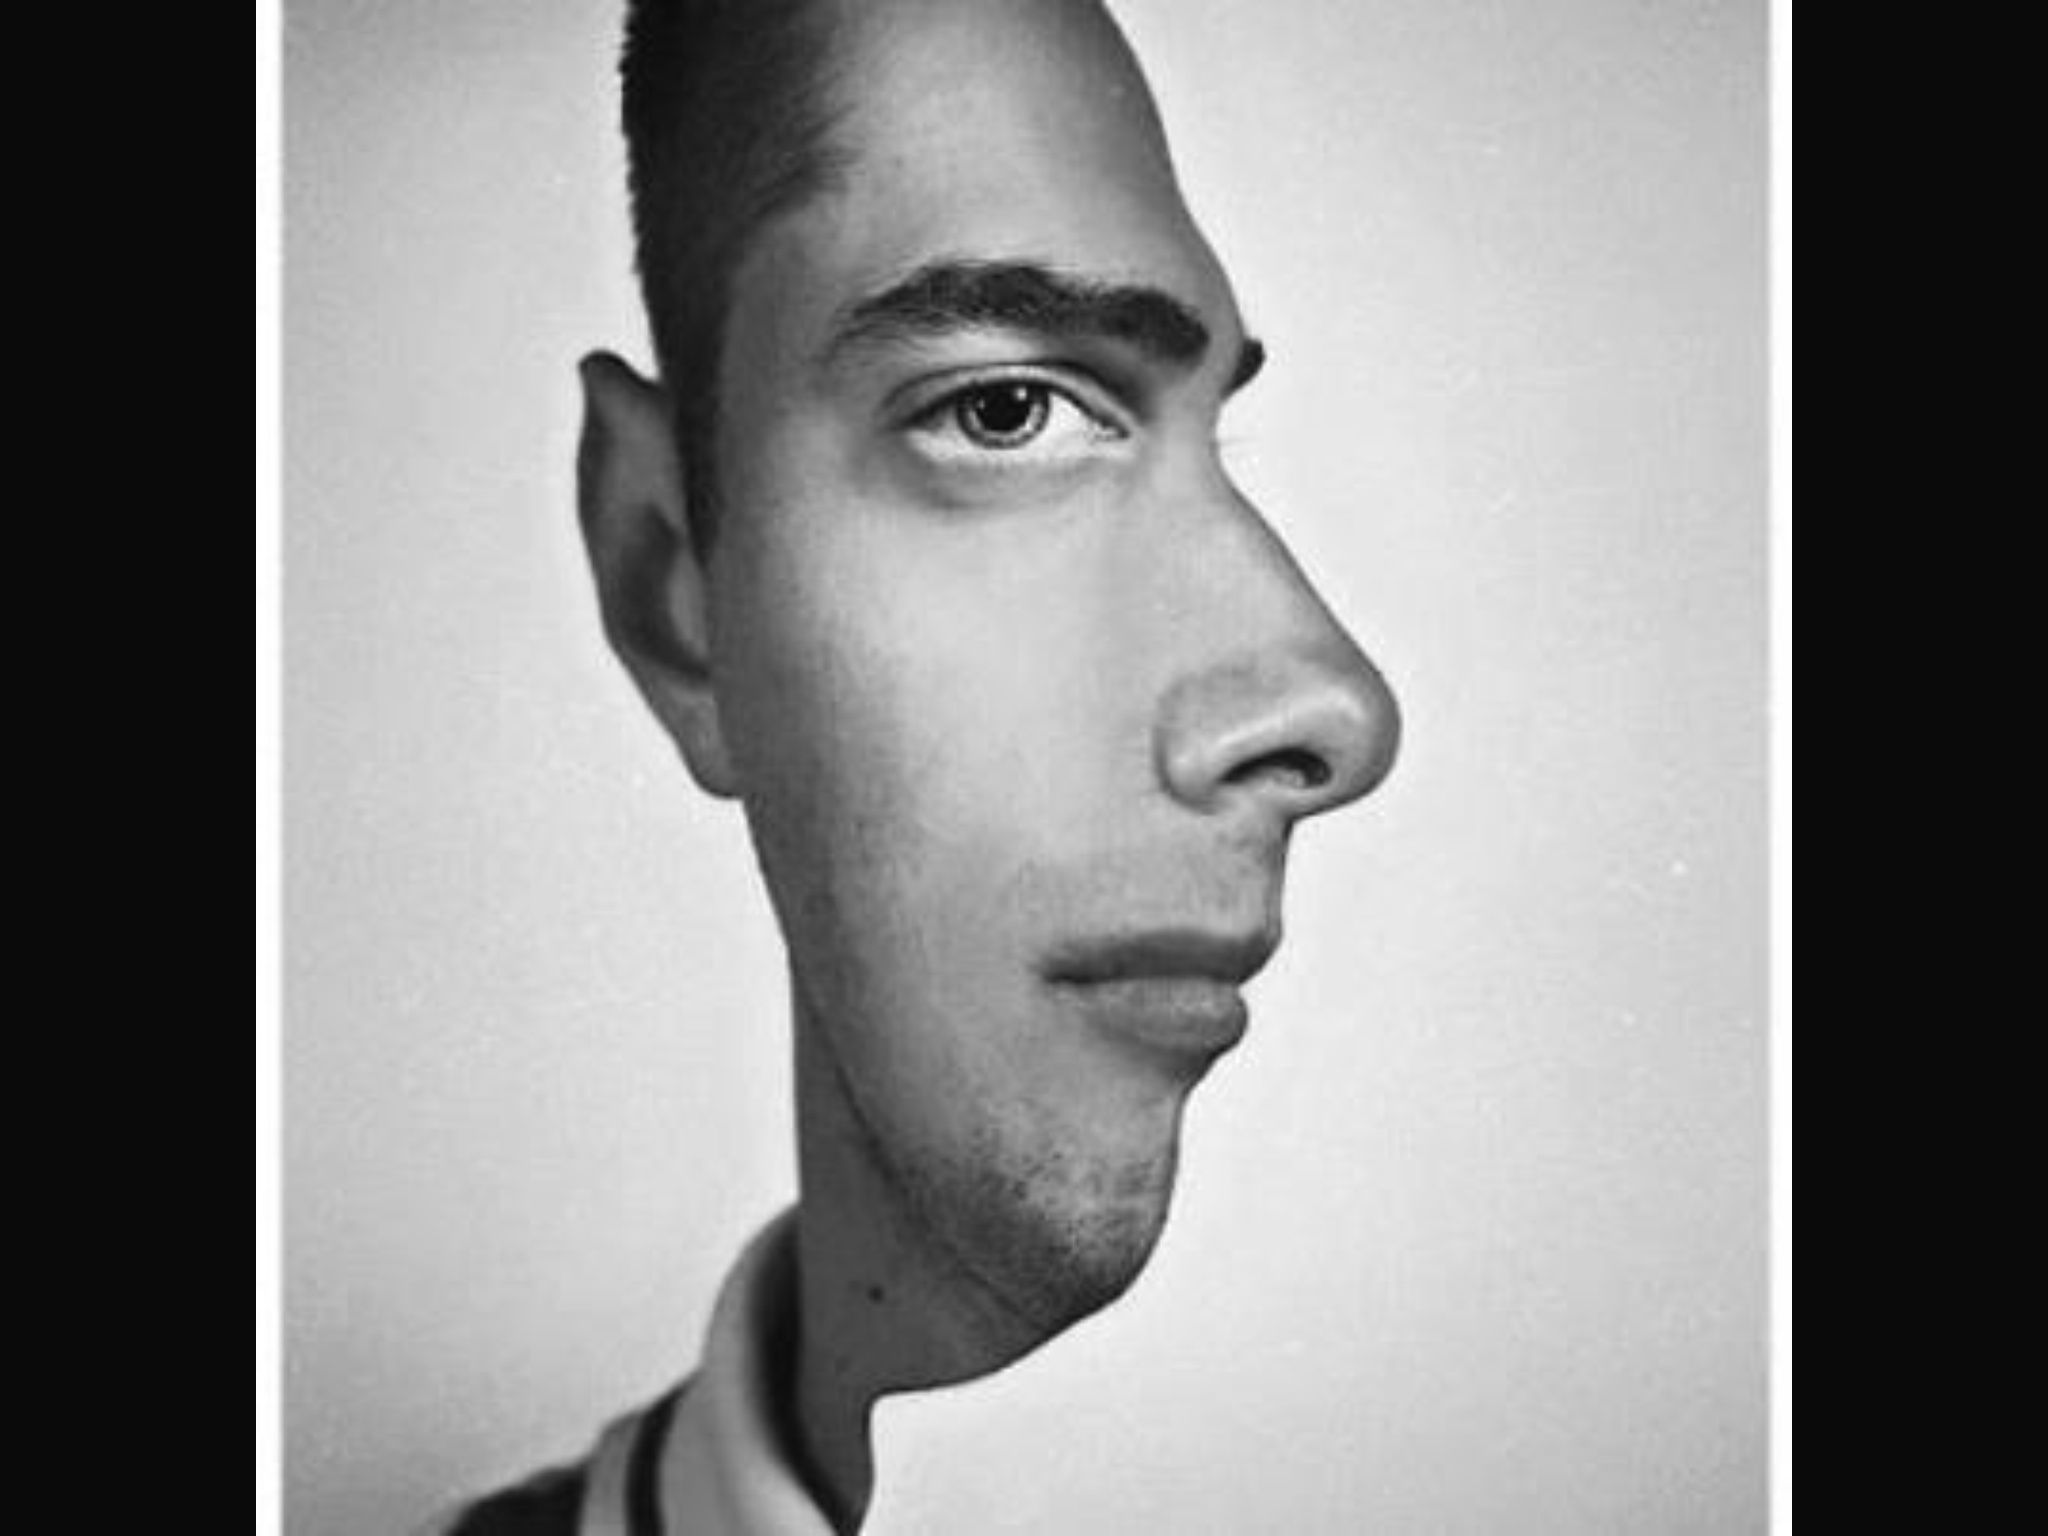 optical faces illusions illusion face visual visit profile